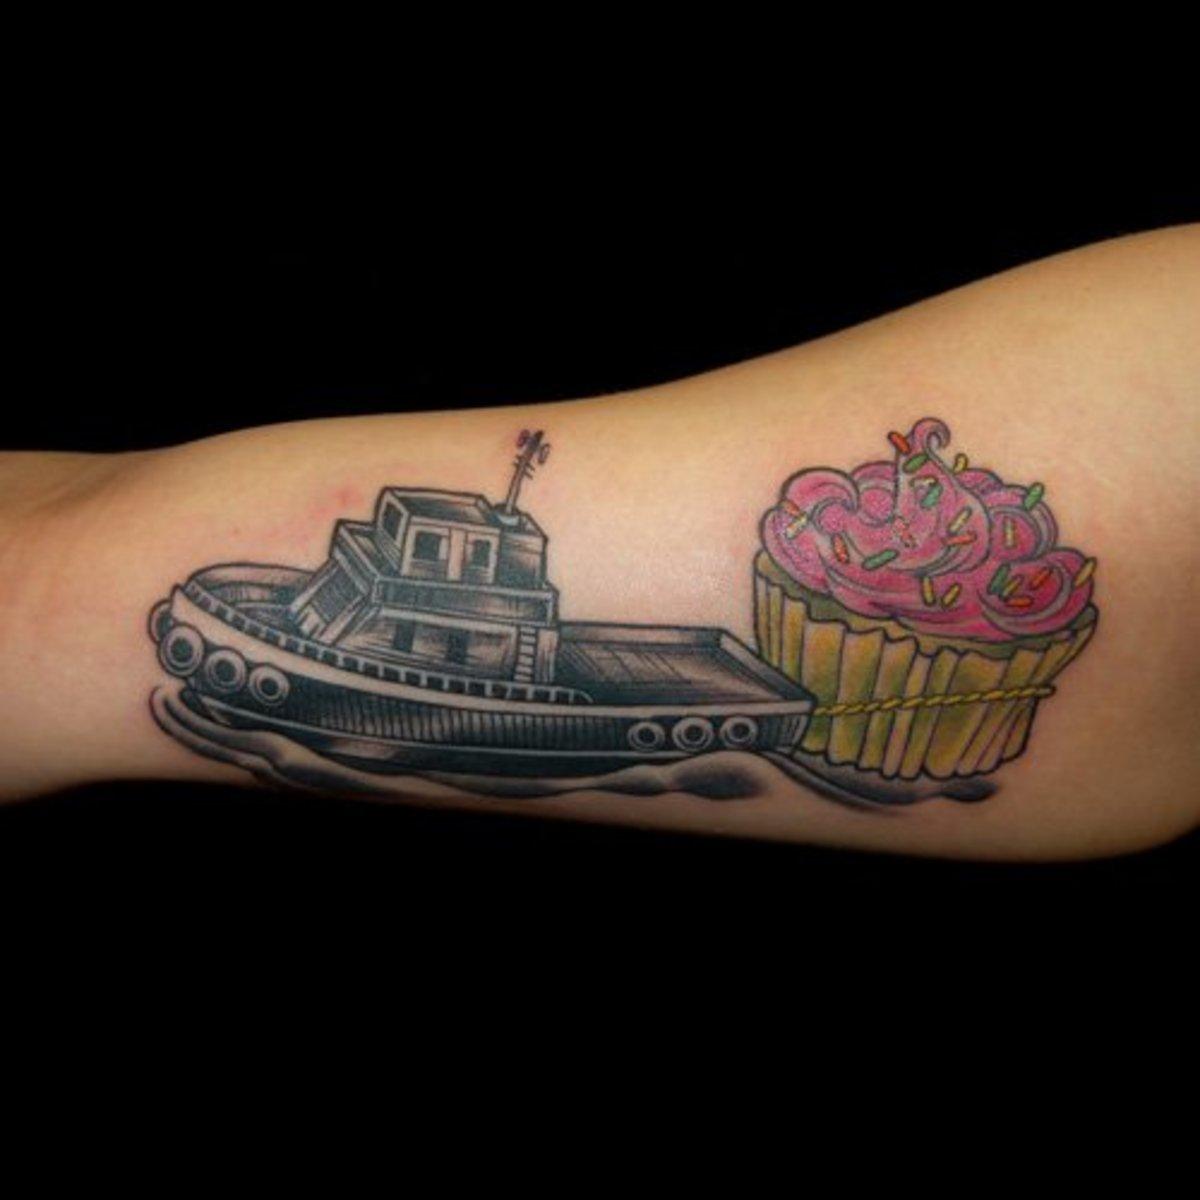 Boat And Ship Tattoos